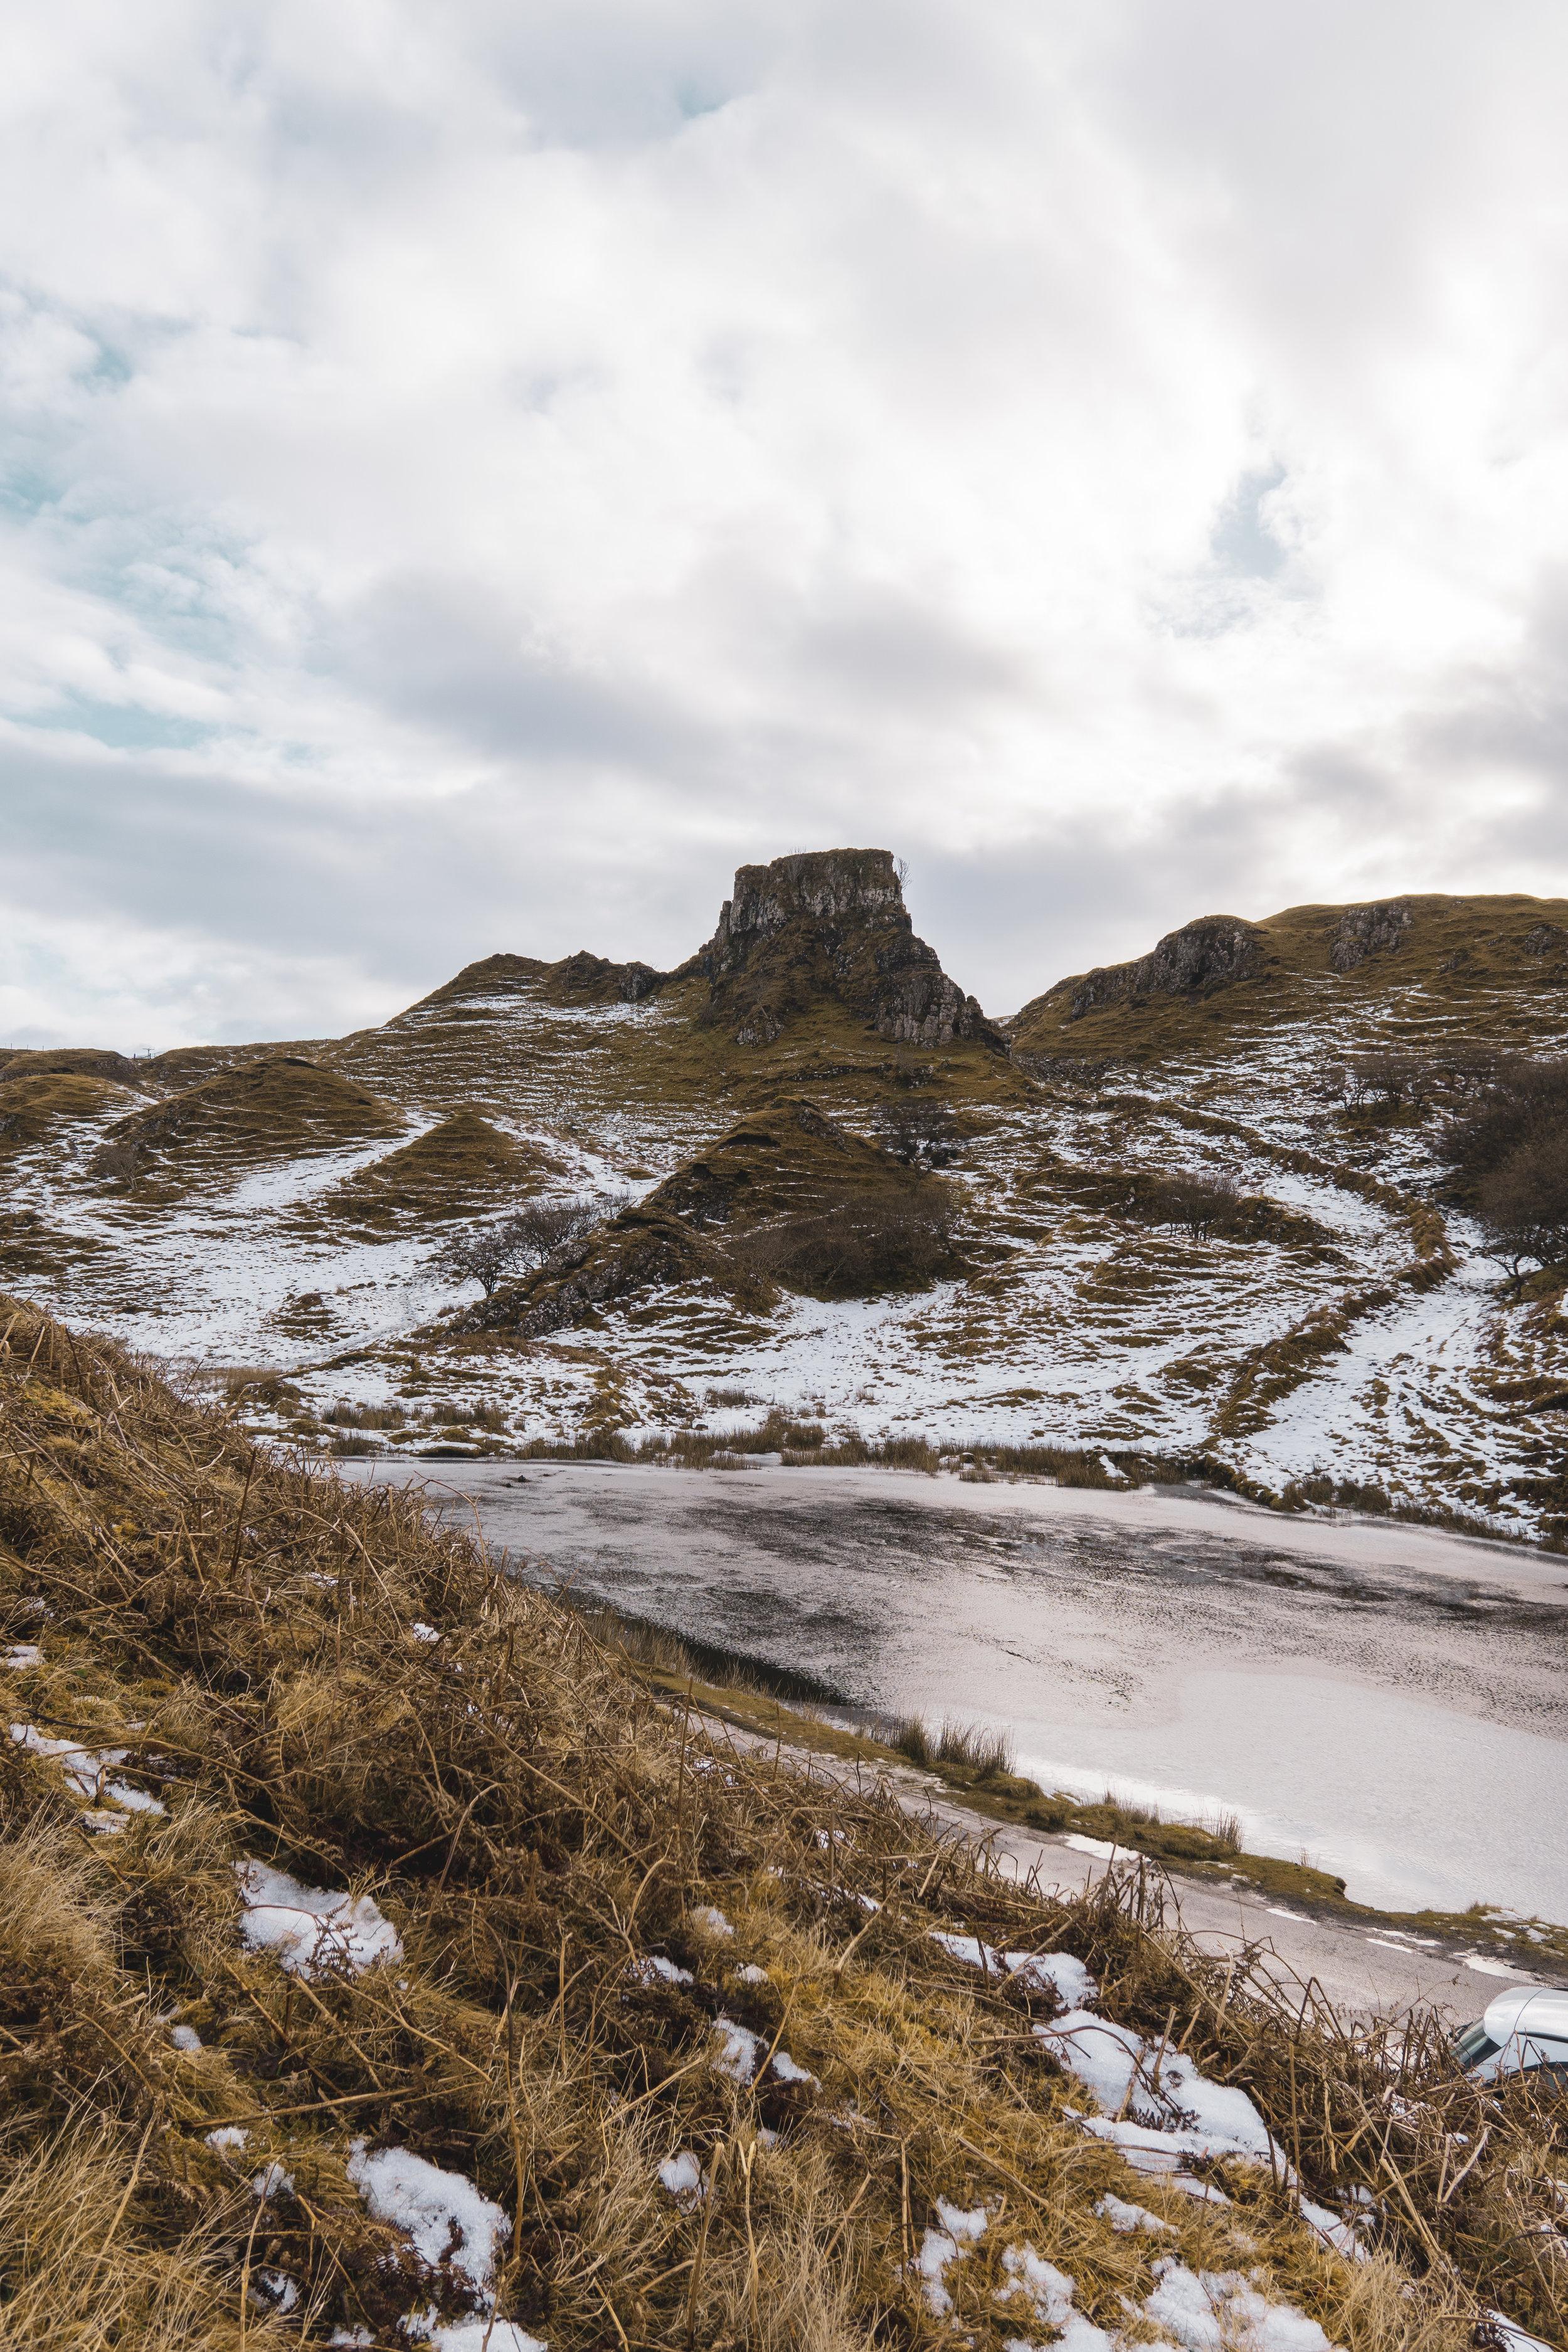 Isle-of-Skye-Fairy-Glen-und-Braes (15).jpg